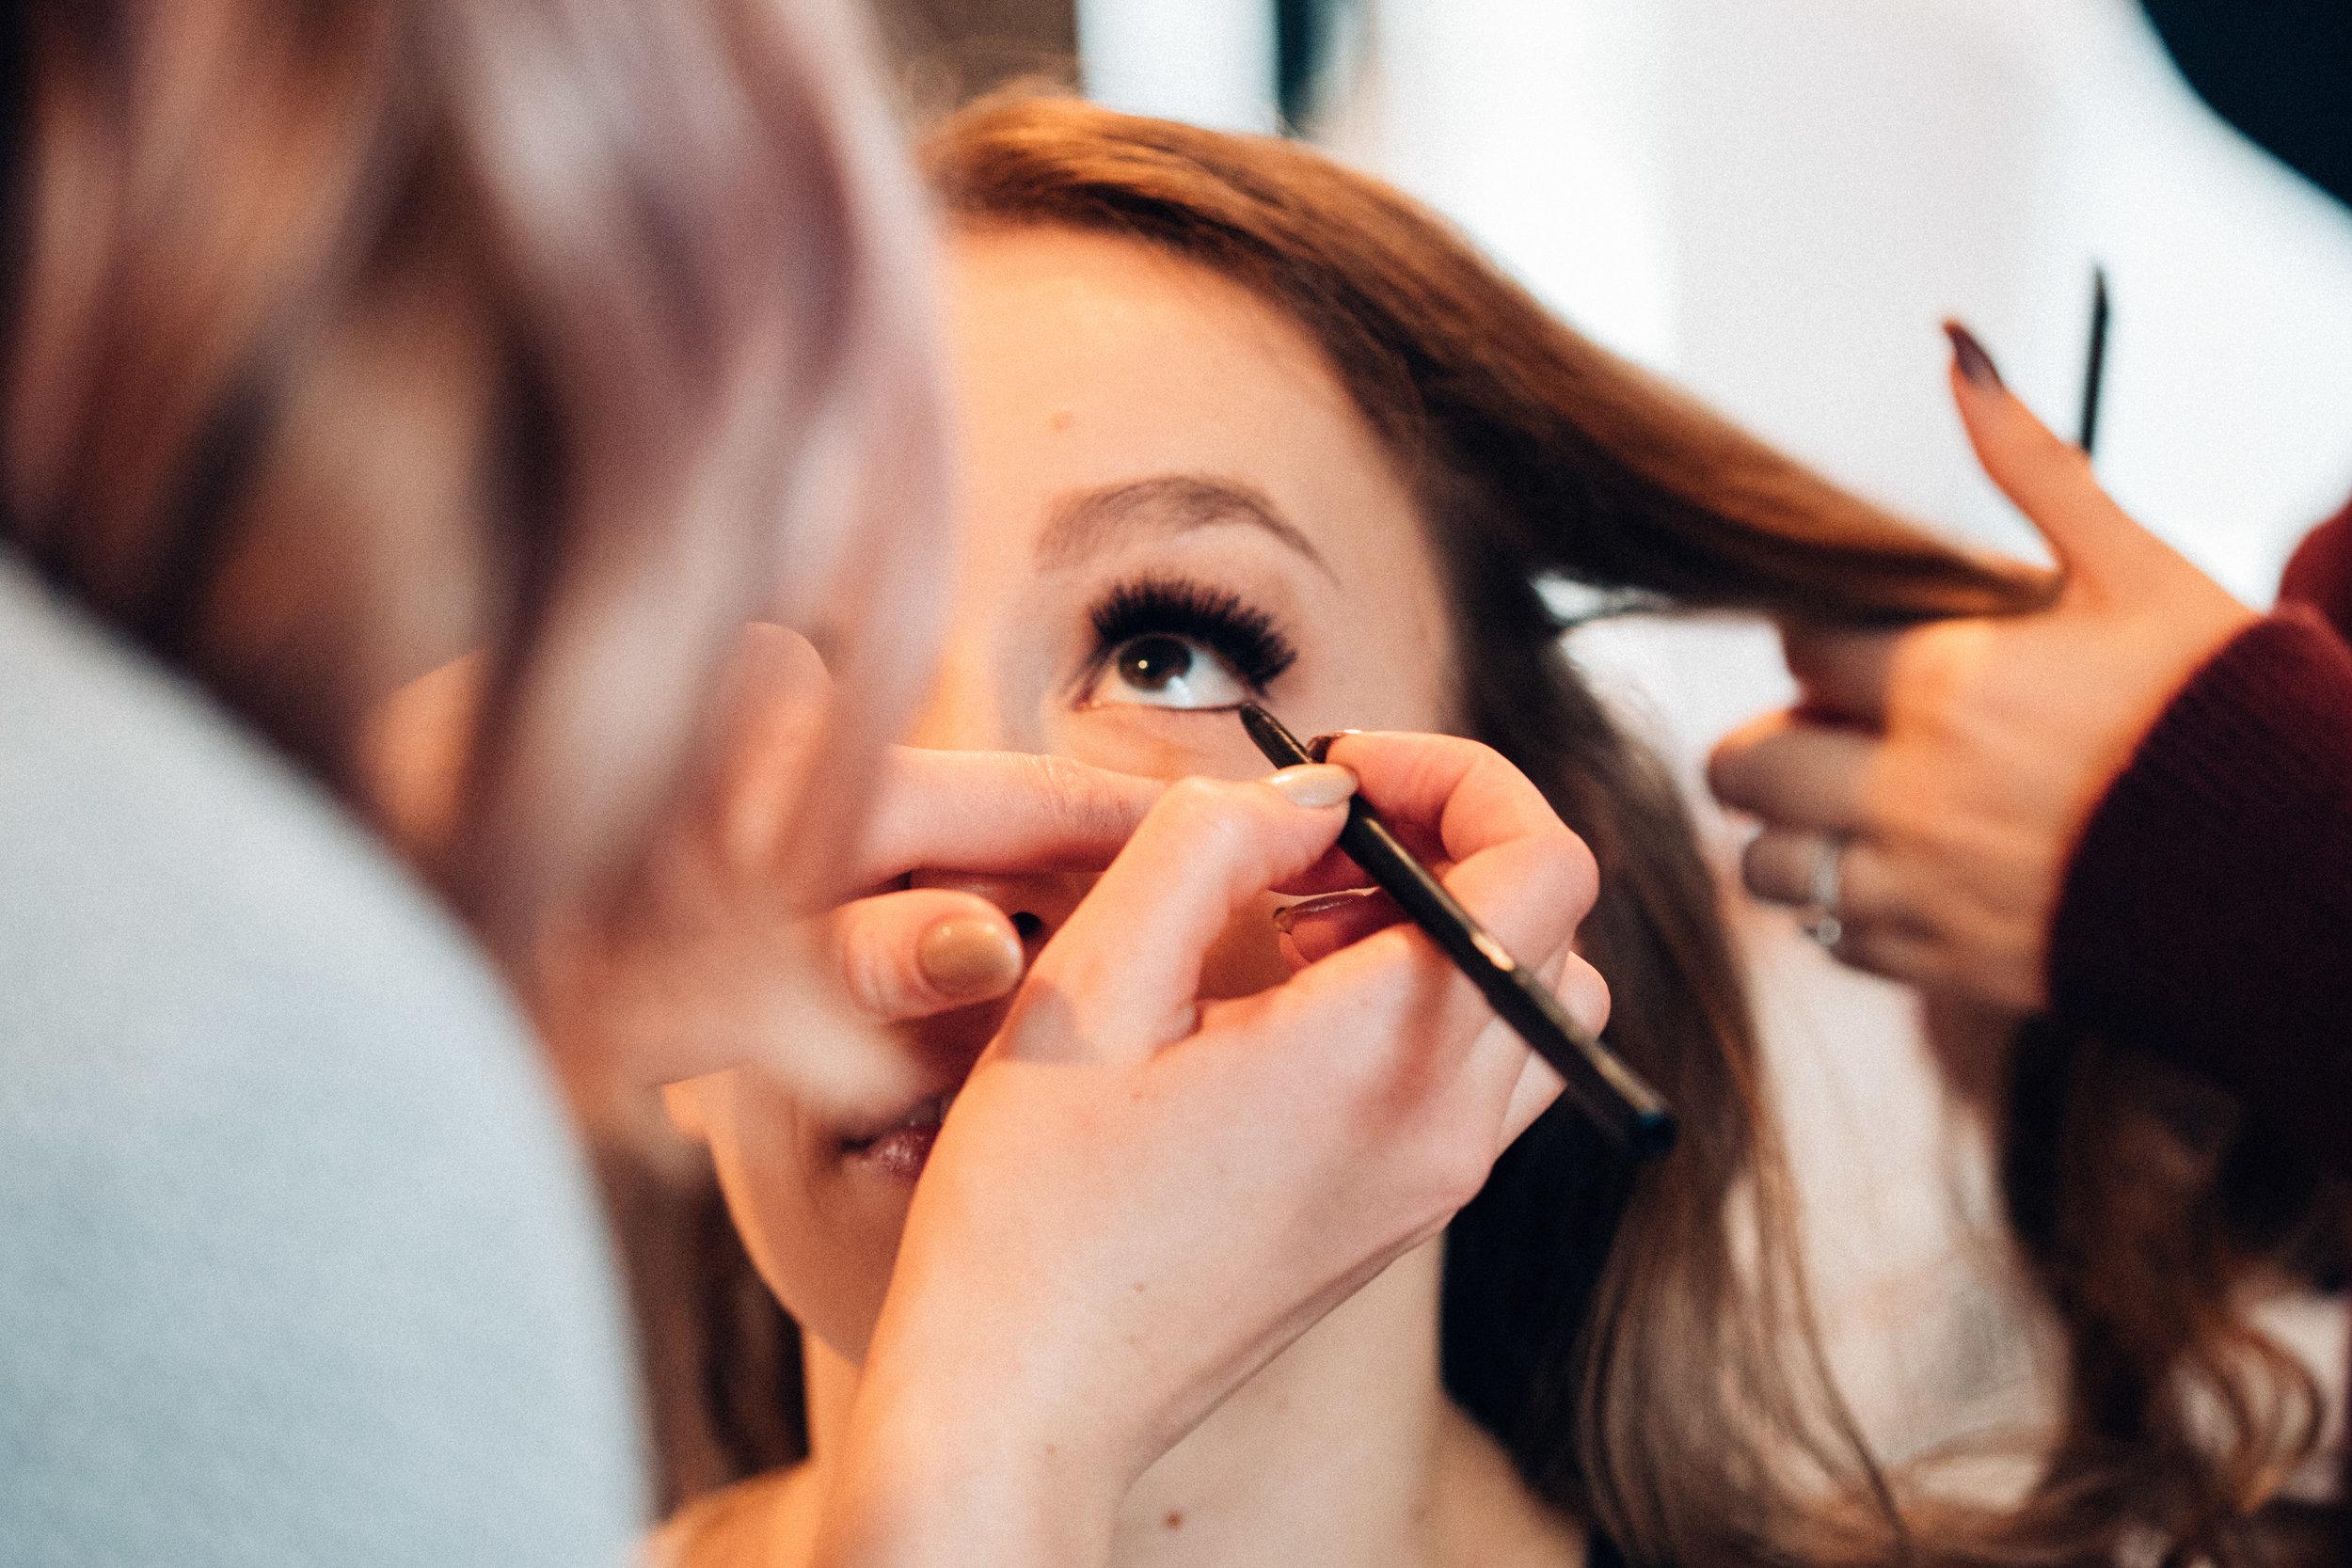 hudsonvalley-photographer-vendors-make-up-hair-portraits-12.jpg